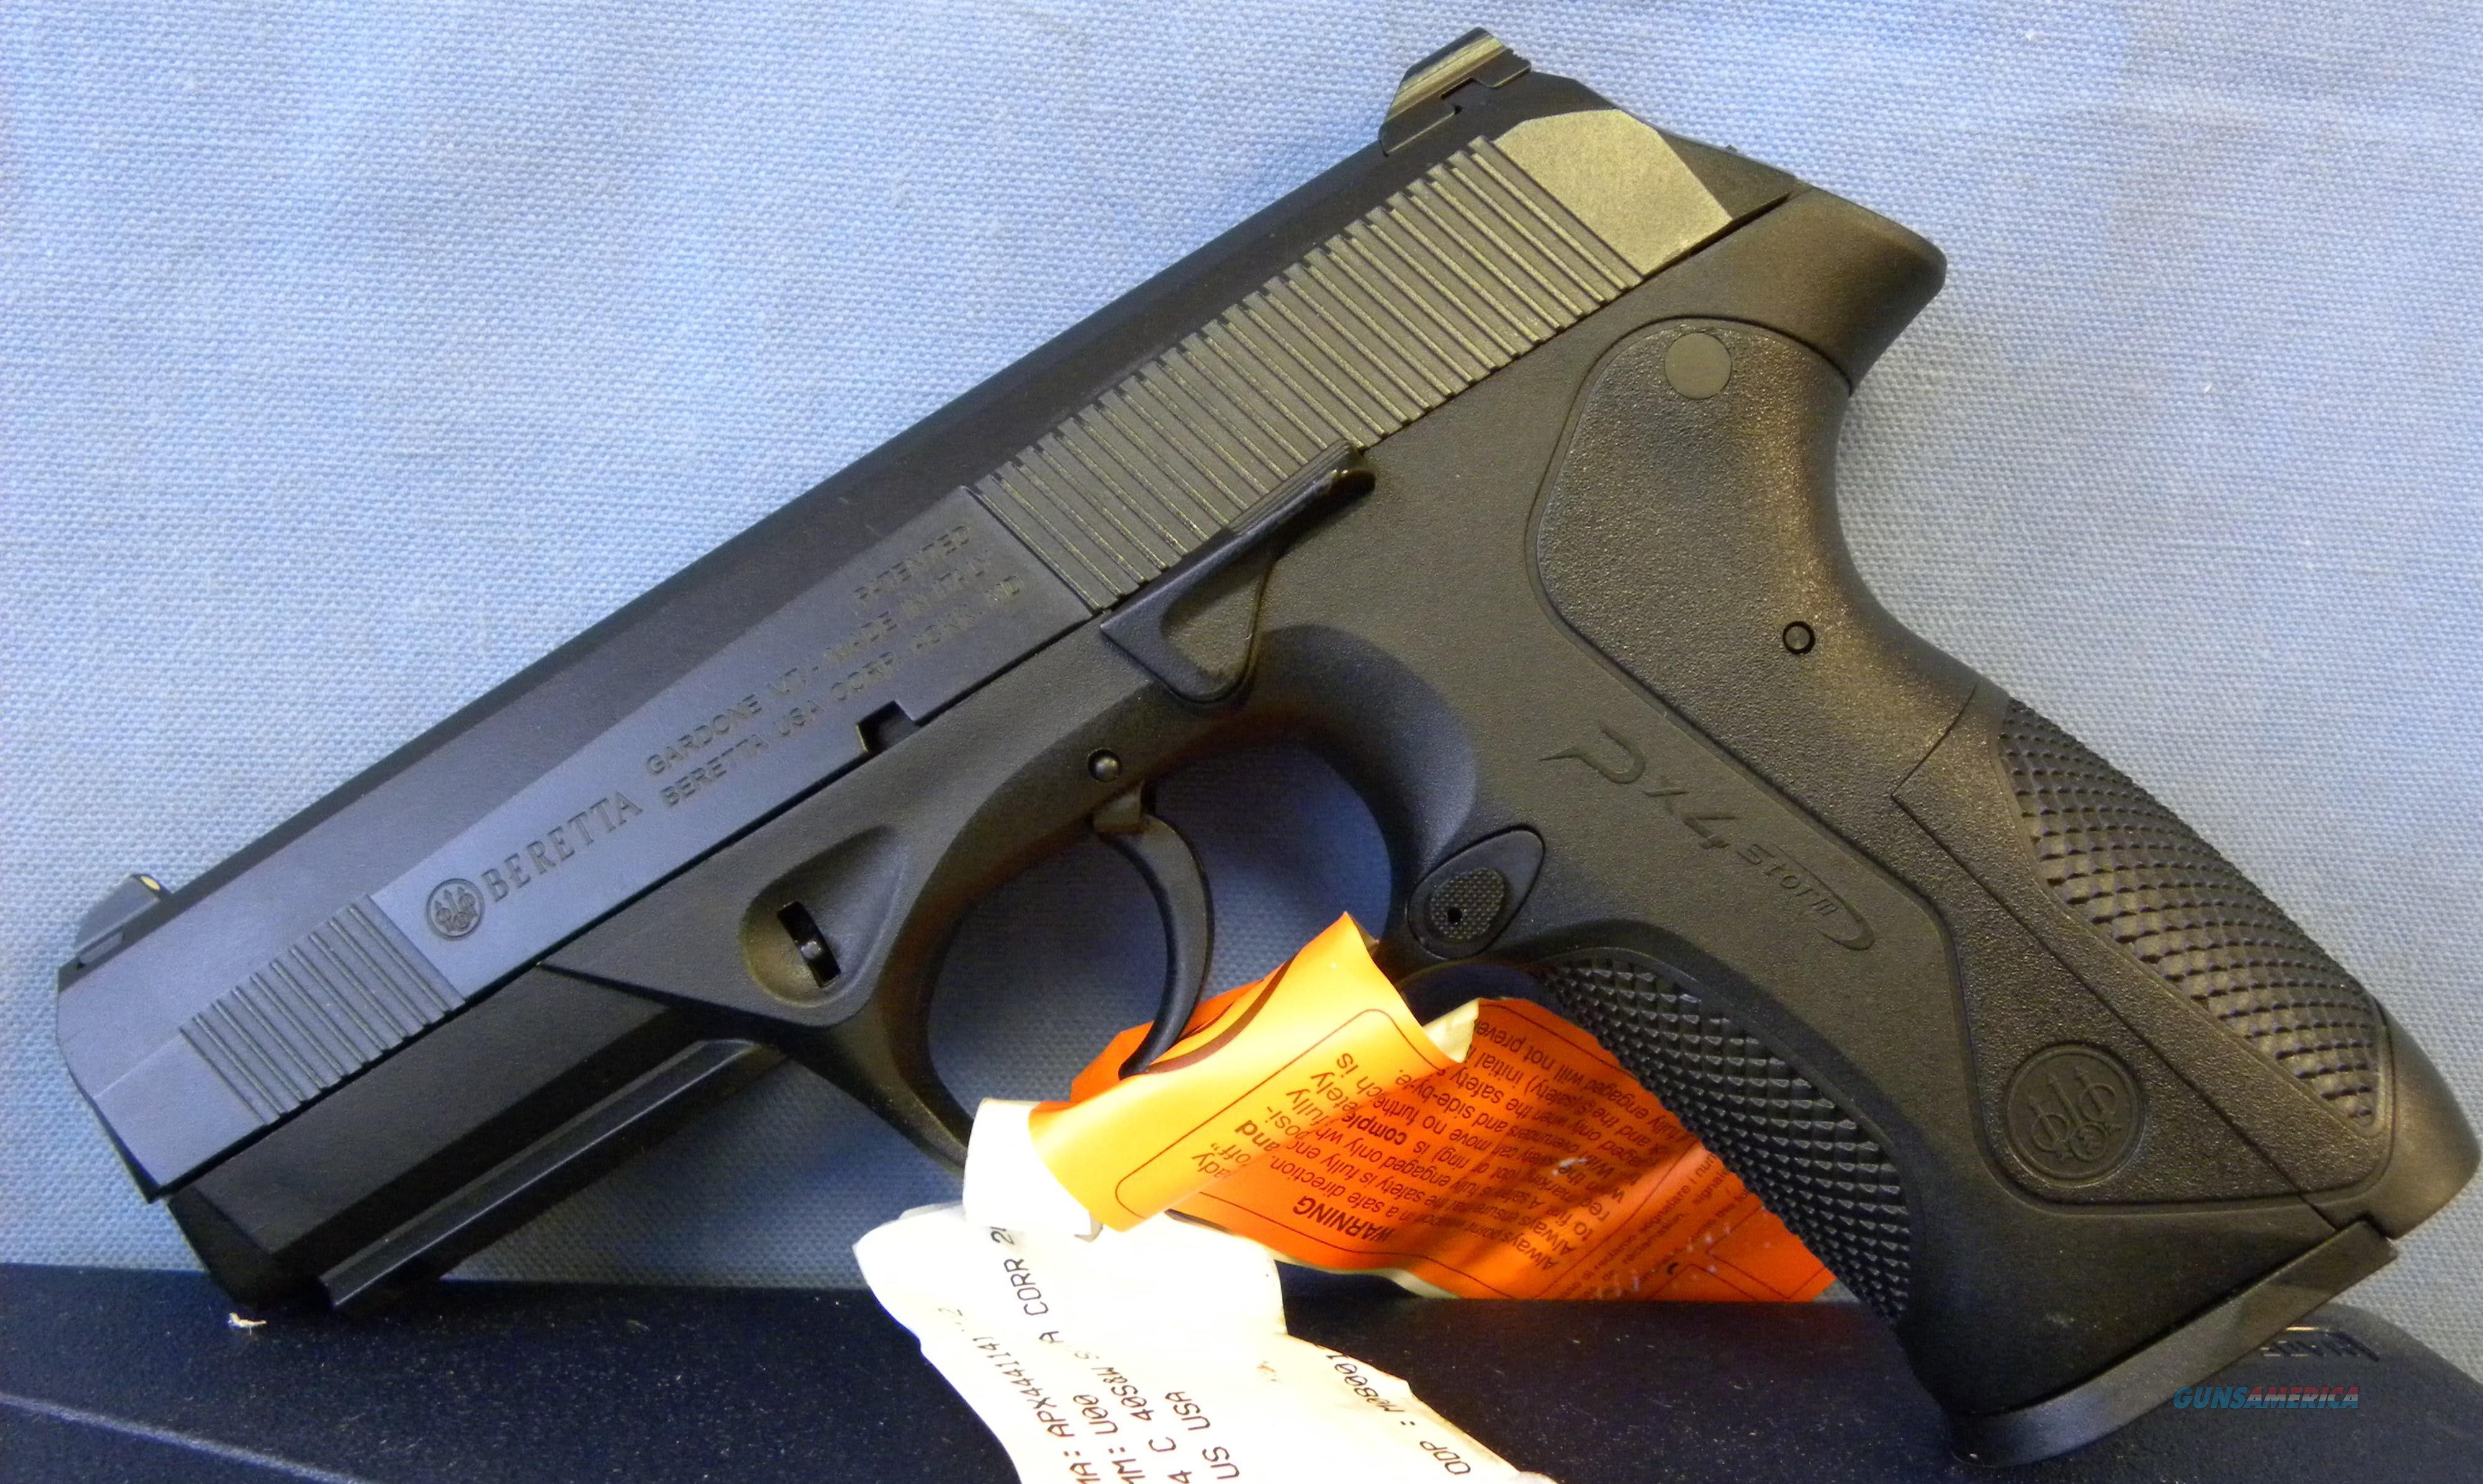 Beretta PX4 C .40 S&W  Guns > Pistols > Beretta Pistols > Polymer Frame